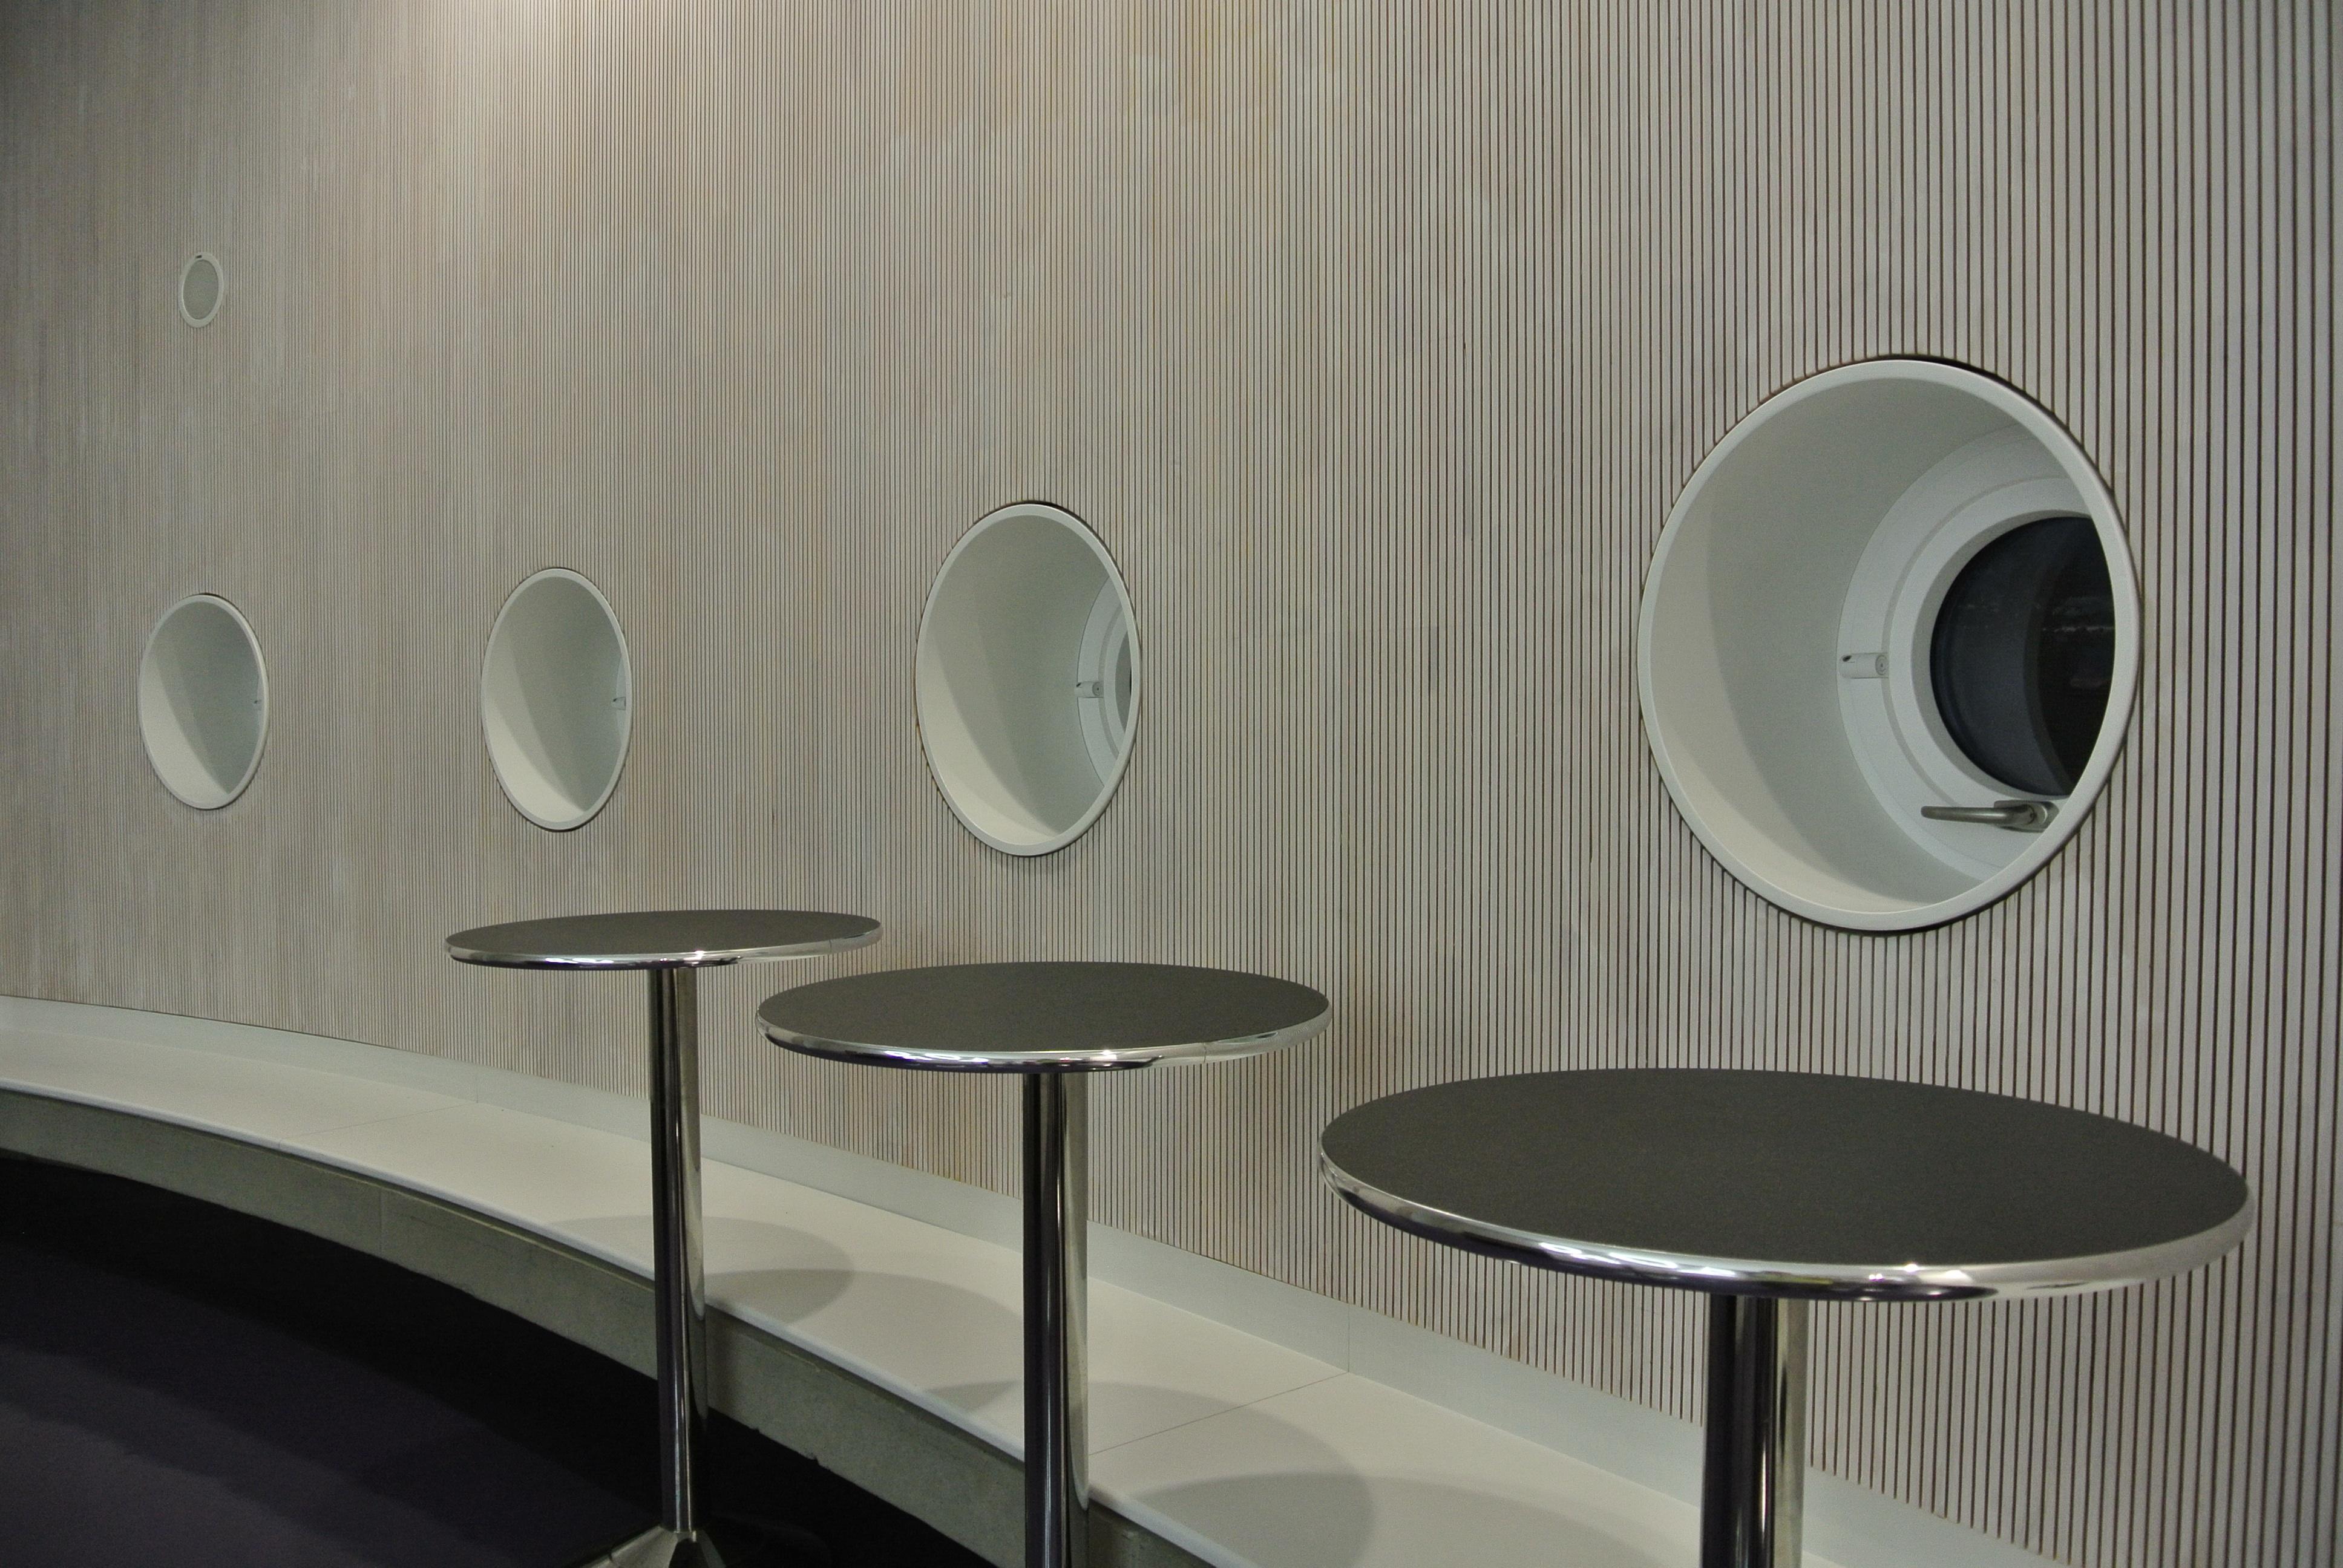 Bad Tafel Hout : Gratis afbeeldingen tafel hout plafond wastafel meubilair